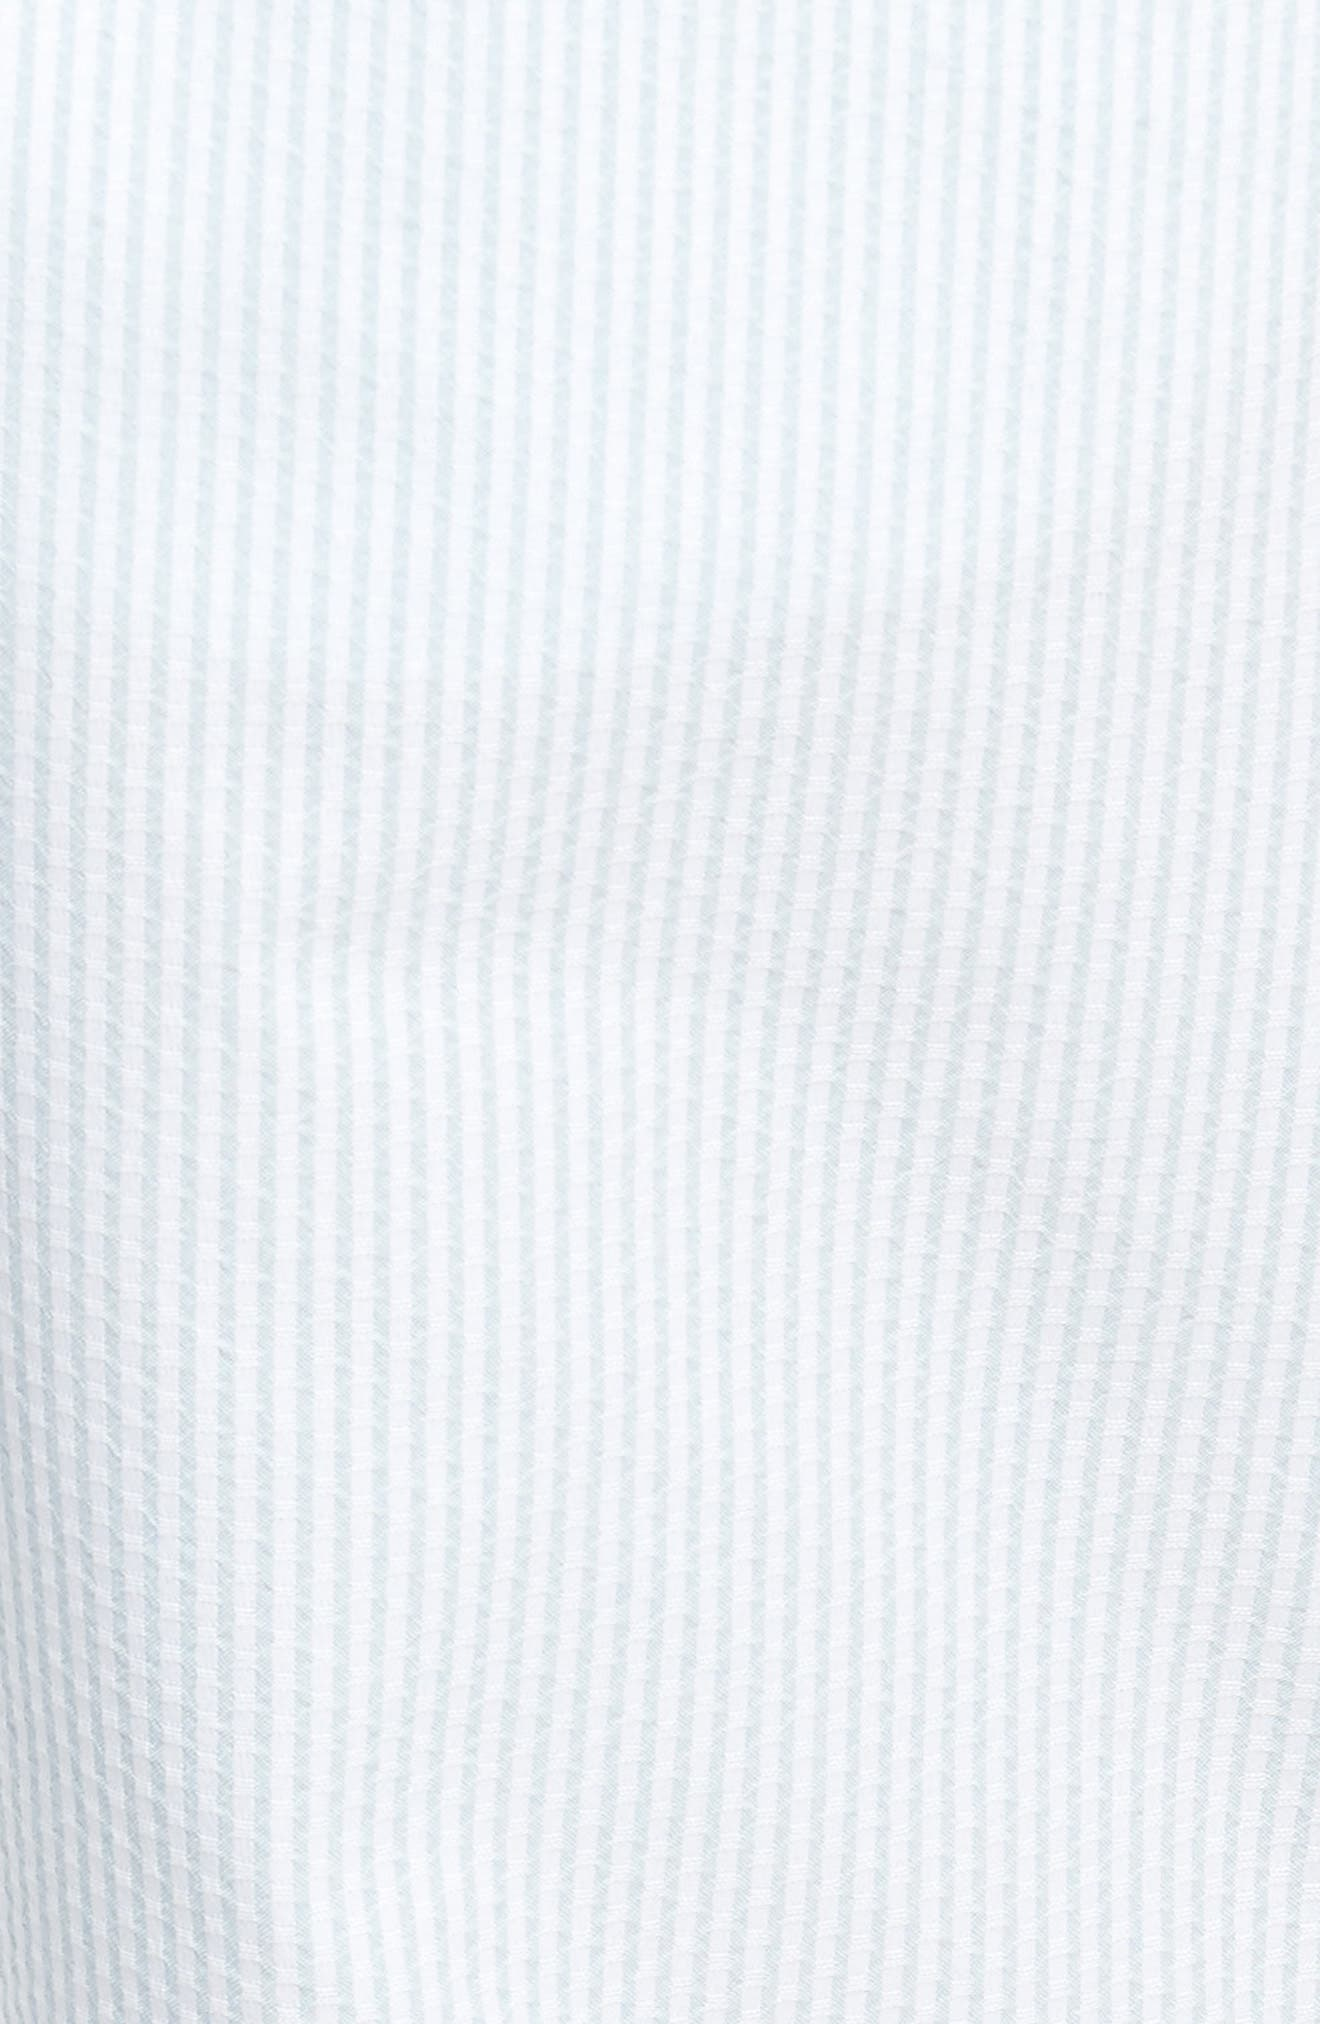 ADIDAS ORIGINALS, Seersucker Track Pants, Alternate thumbnail 6, color, ASH GREY/ WHITE